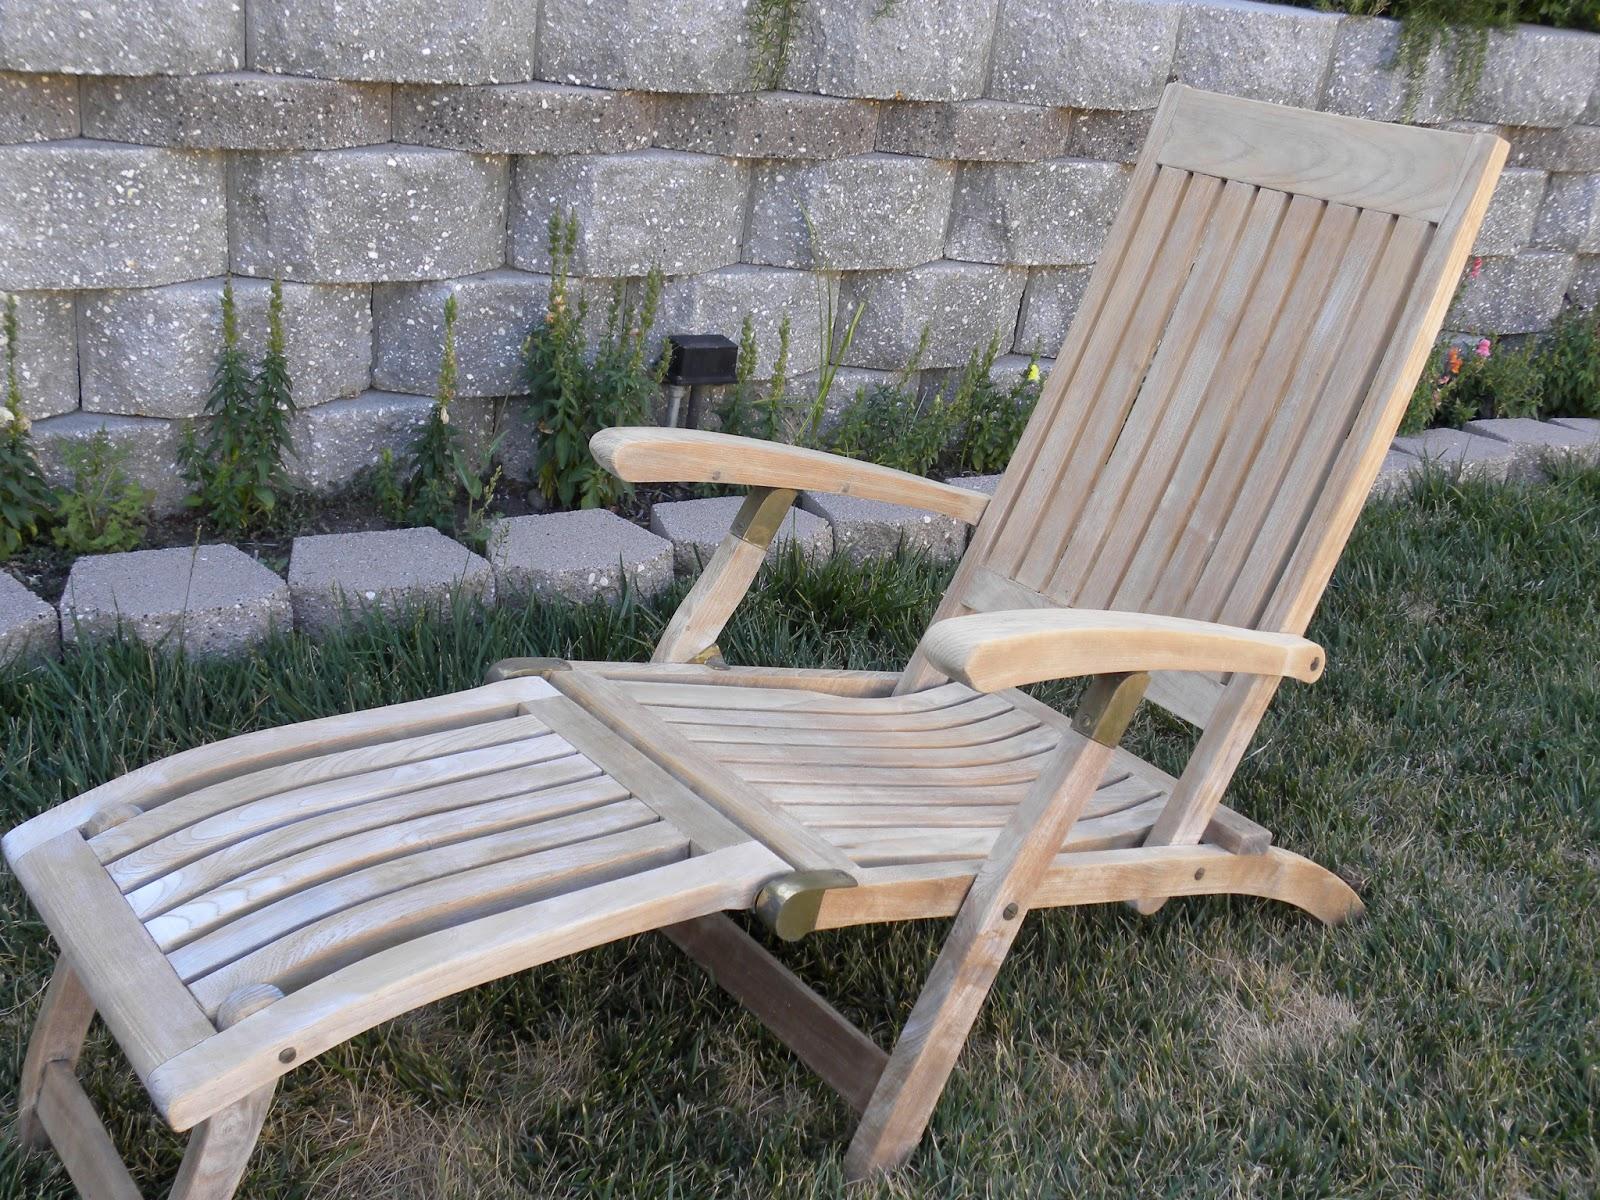 Haniebcreations Diy Restore Old Teak Wood Outdoor Furniture